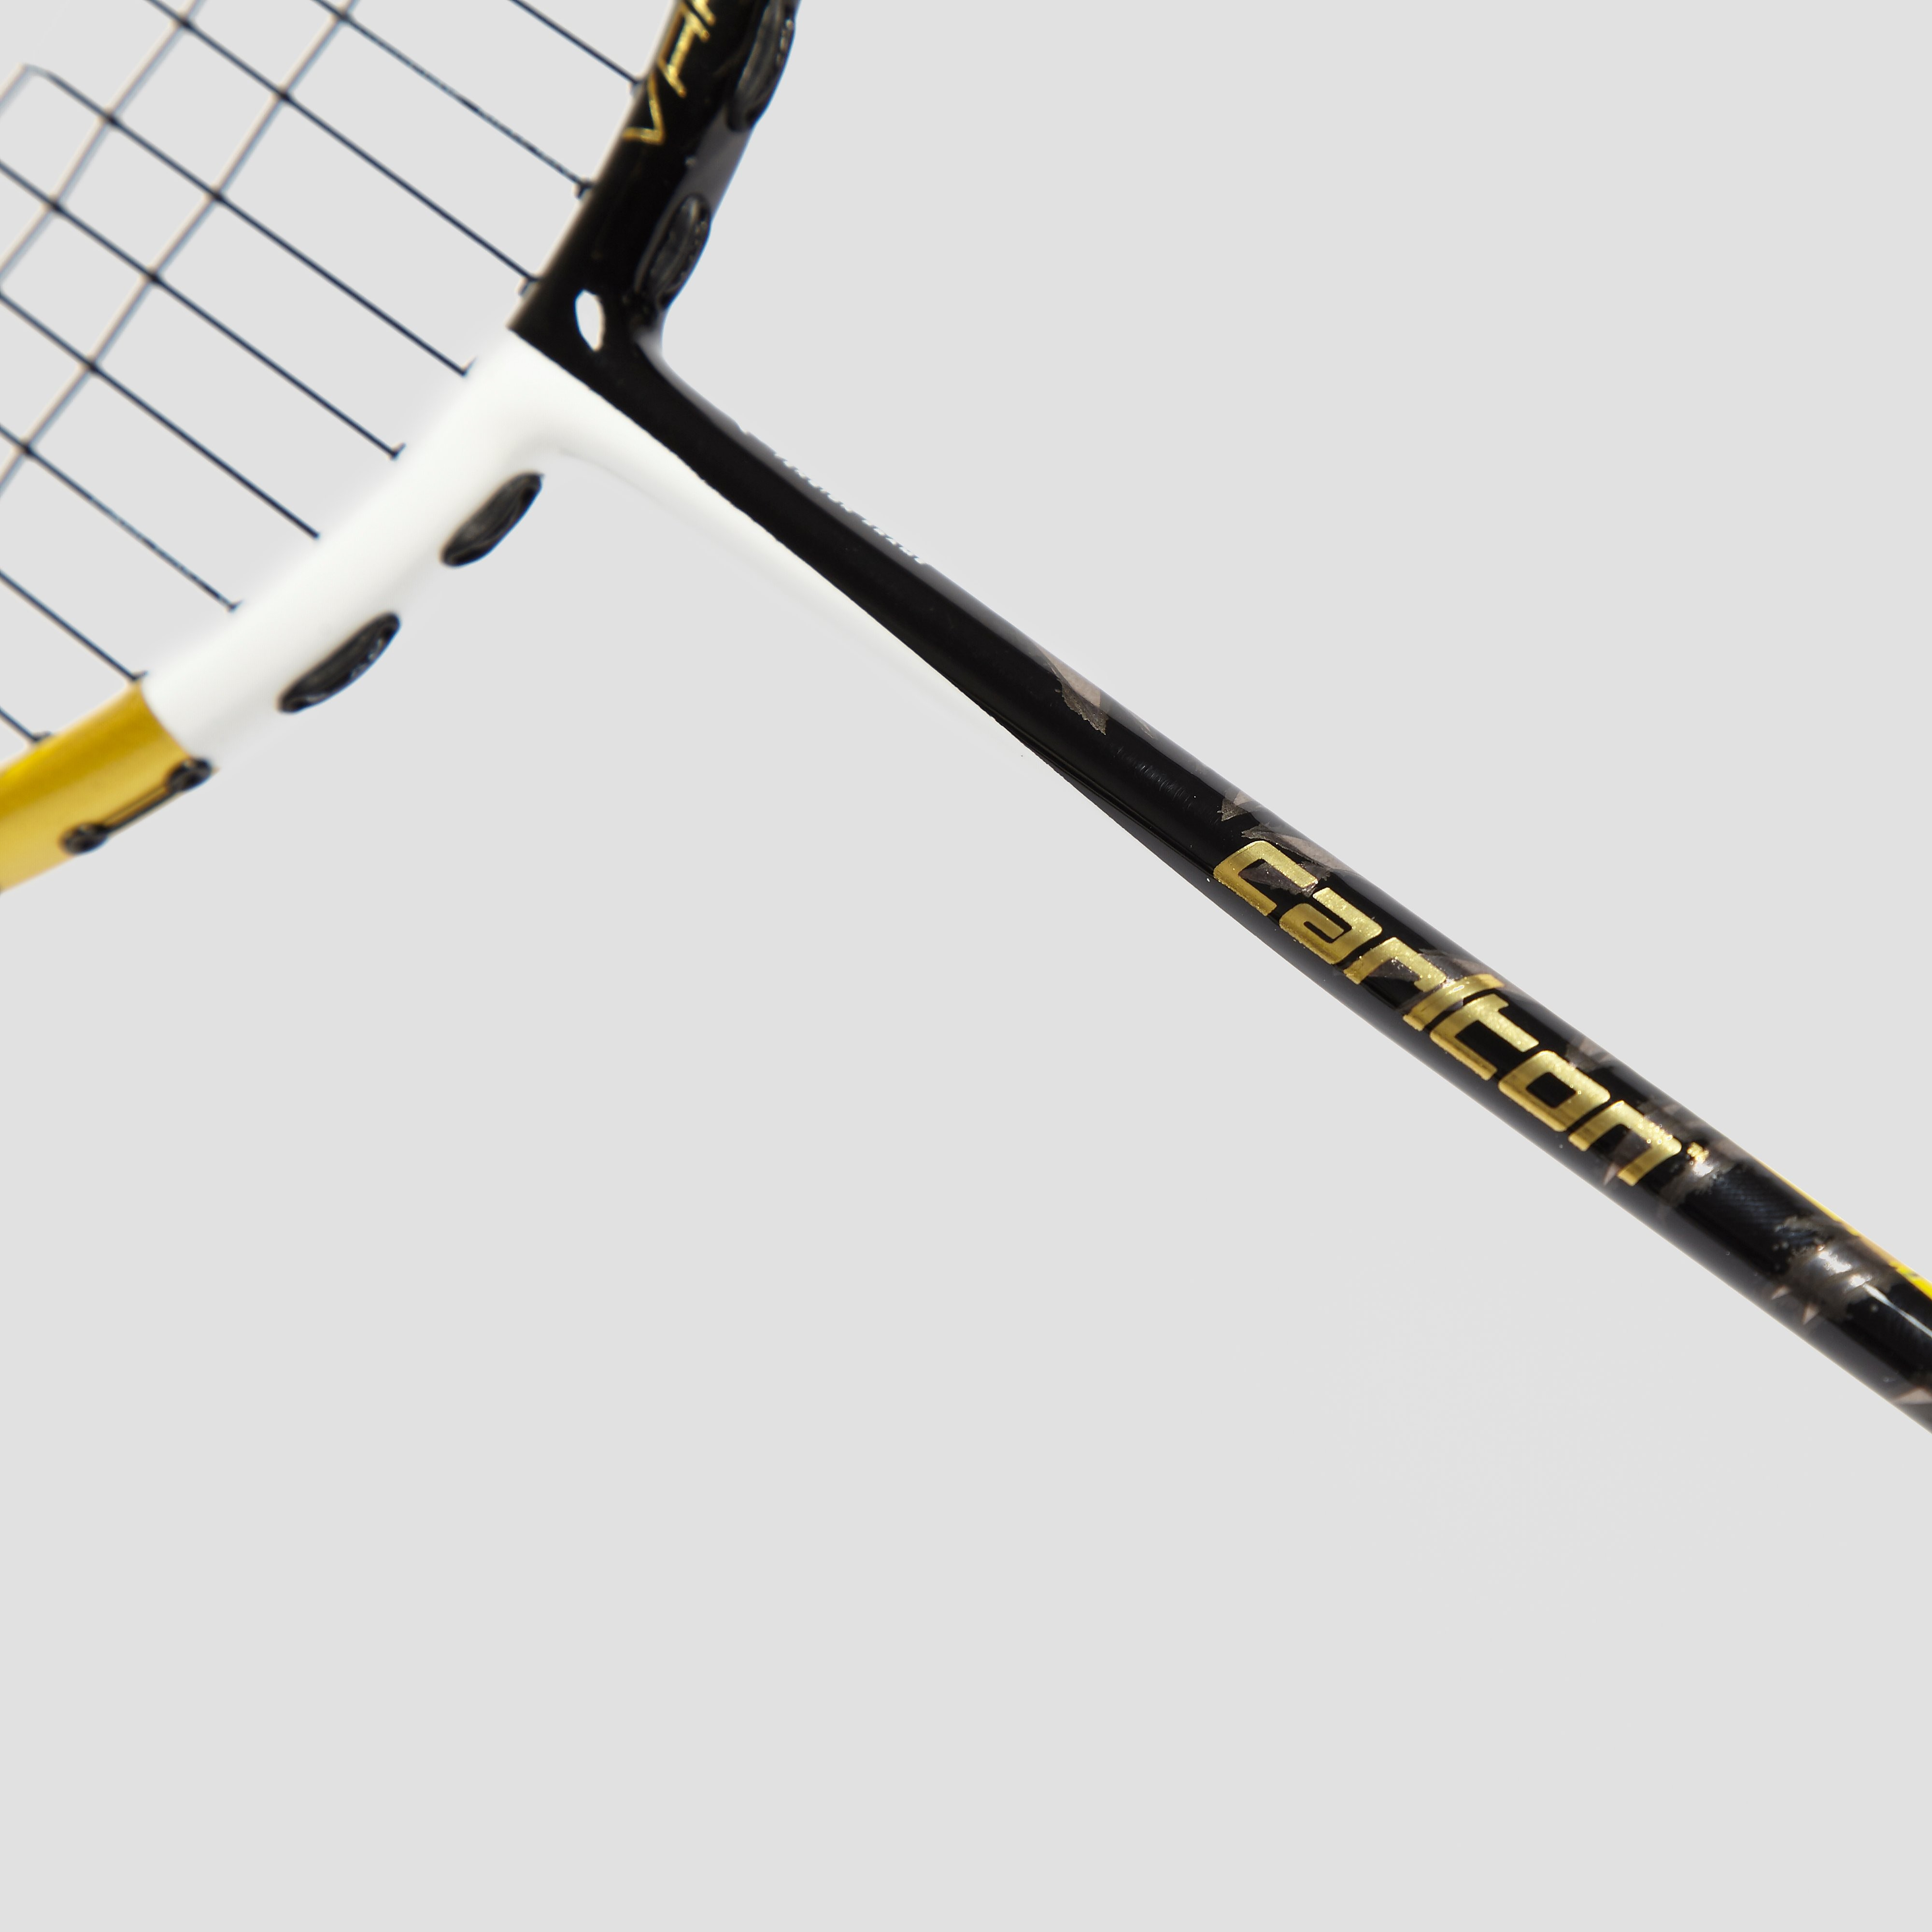 Carlton Vapour Trail Elite Badminton Racket